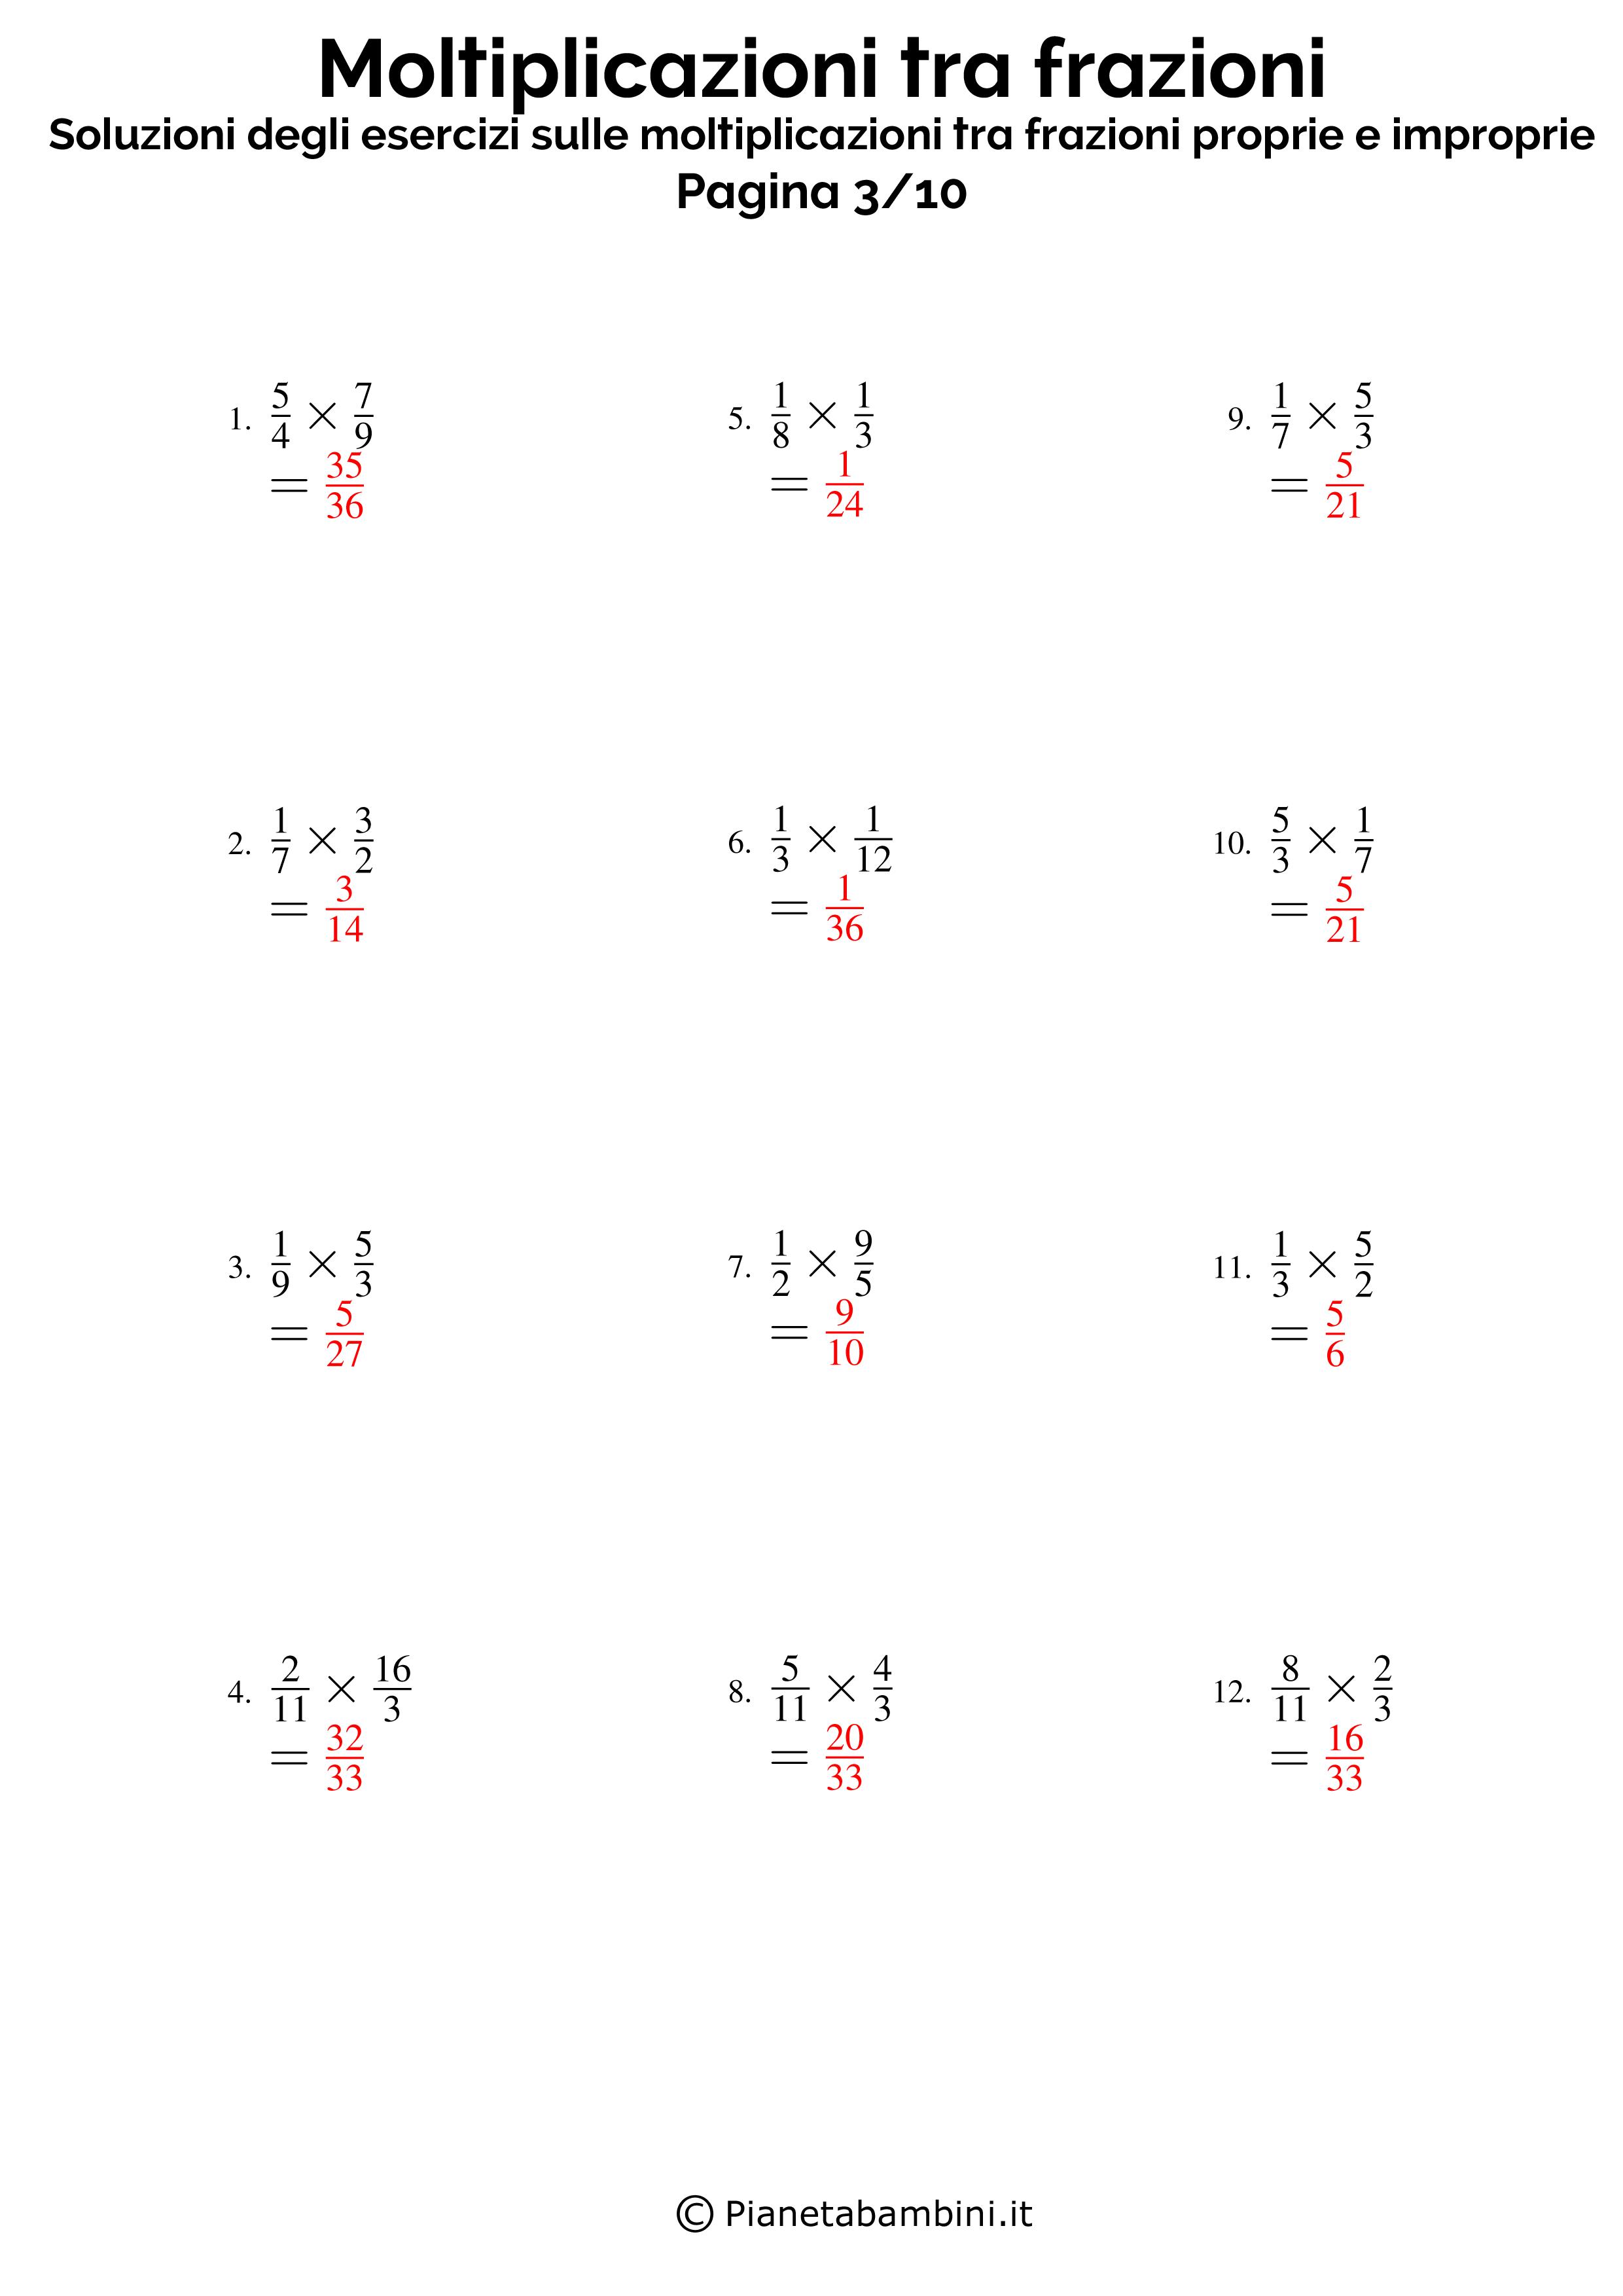 Soluzioni-Moltiplicazioni-Frazioni-Proprie-Improprie_03